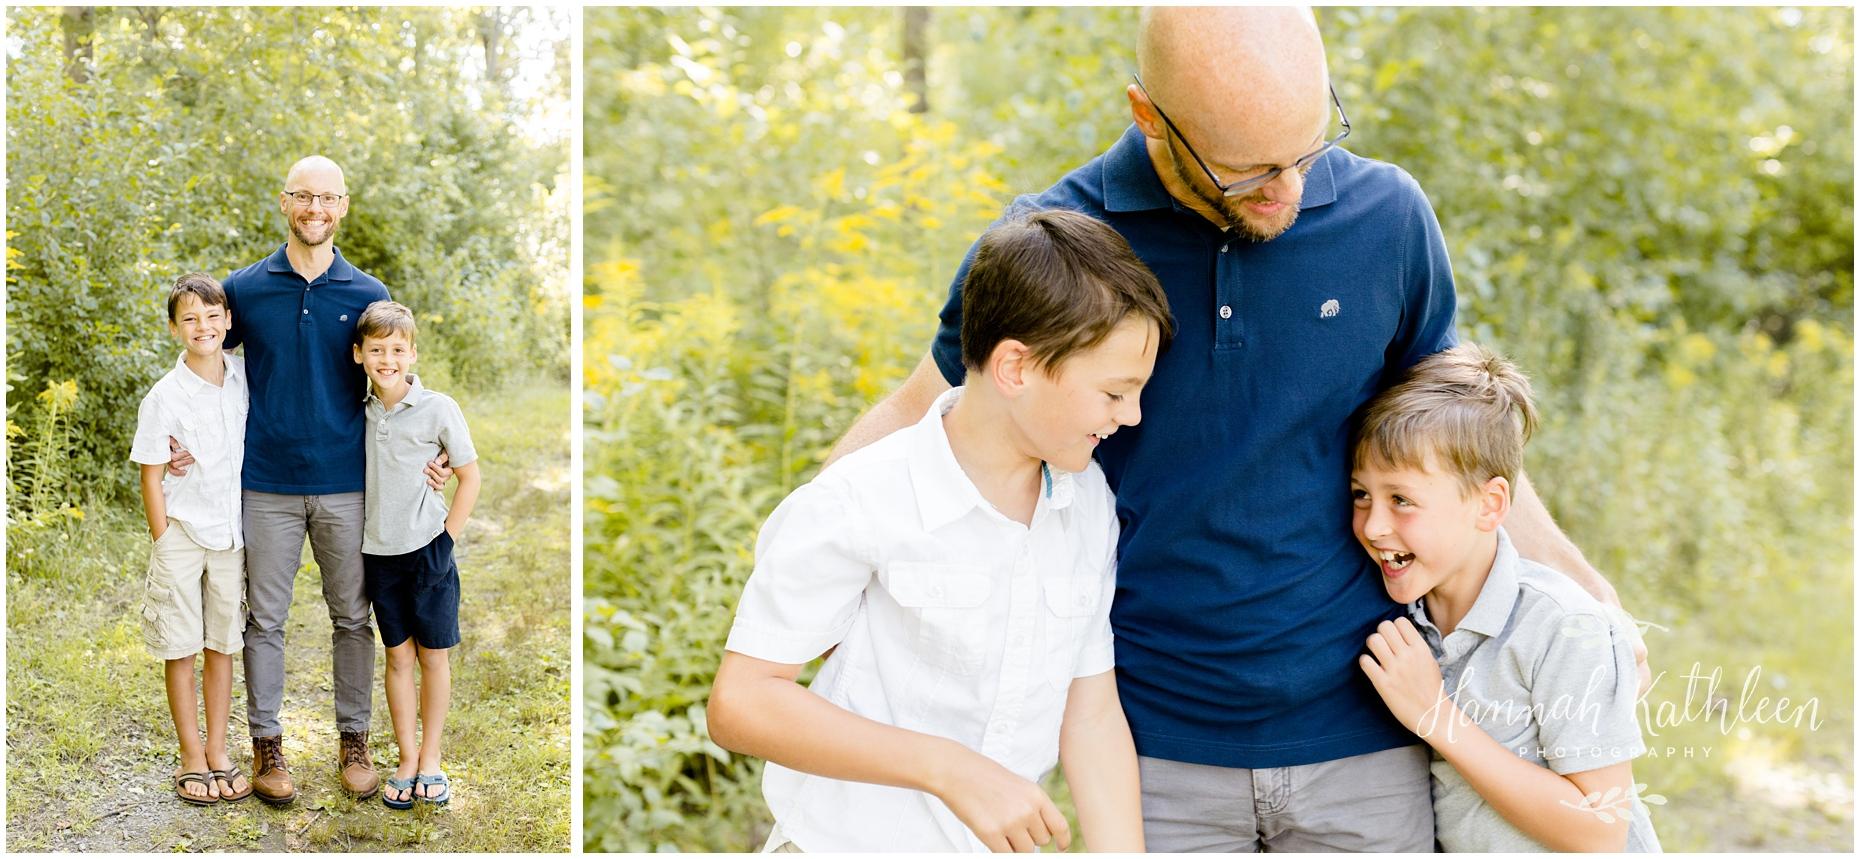 graffam_family_buffalo_photographer_wny_first_birthday_children